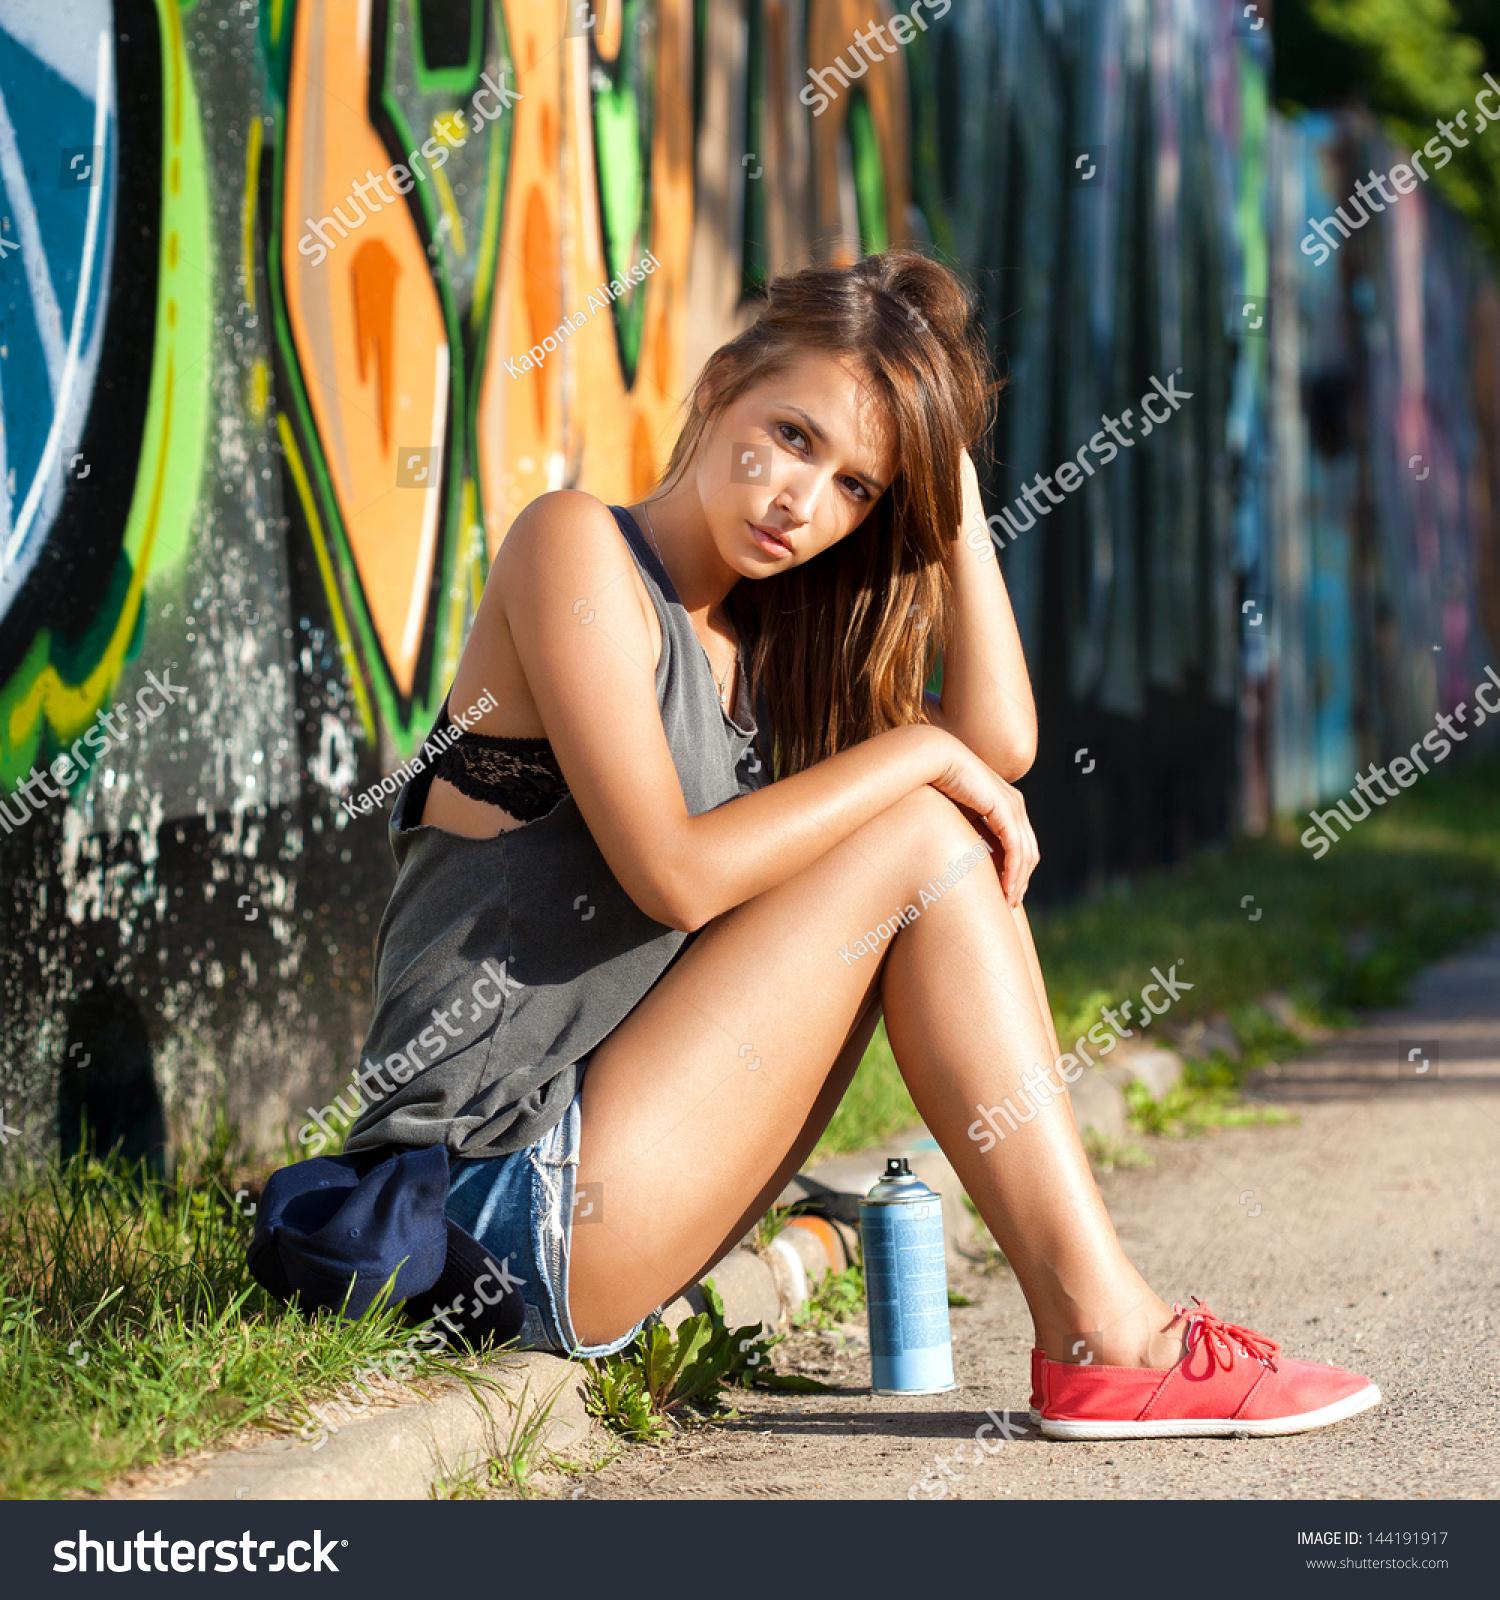 Teen Idol Photo Wall Whit 68